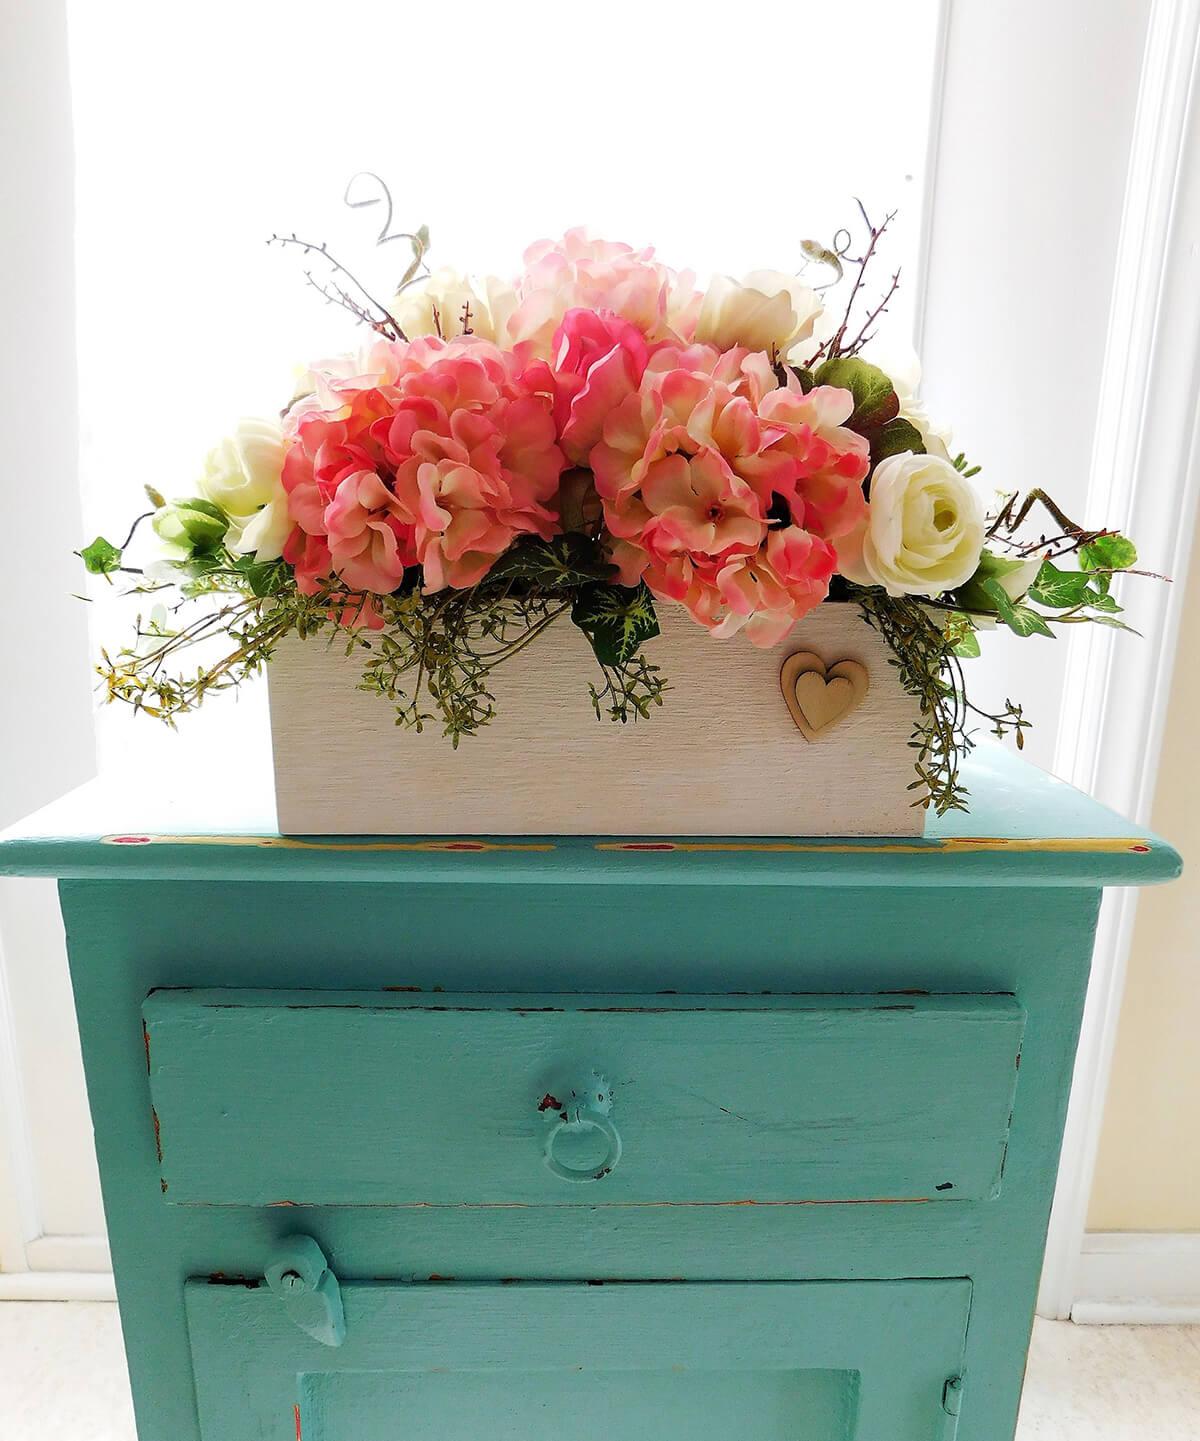 Cottage Chic Planter Box Display